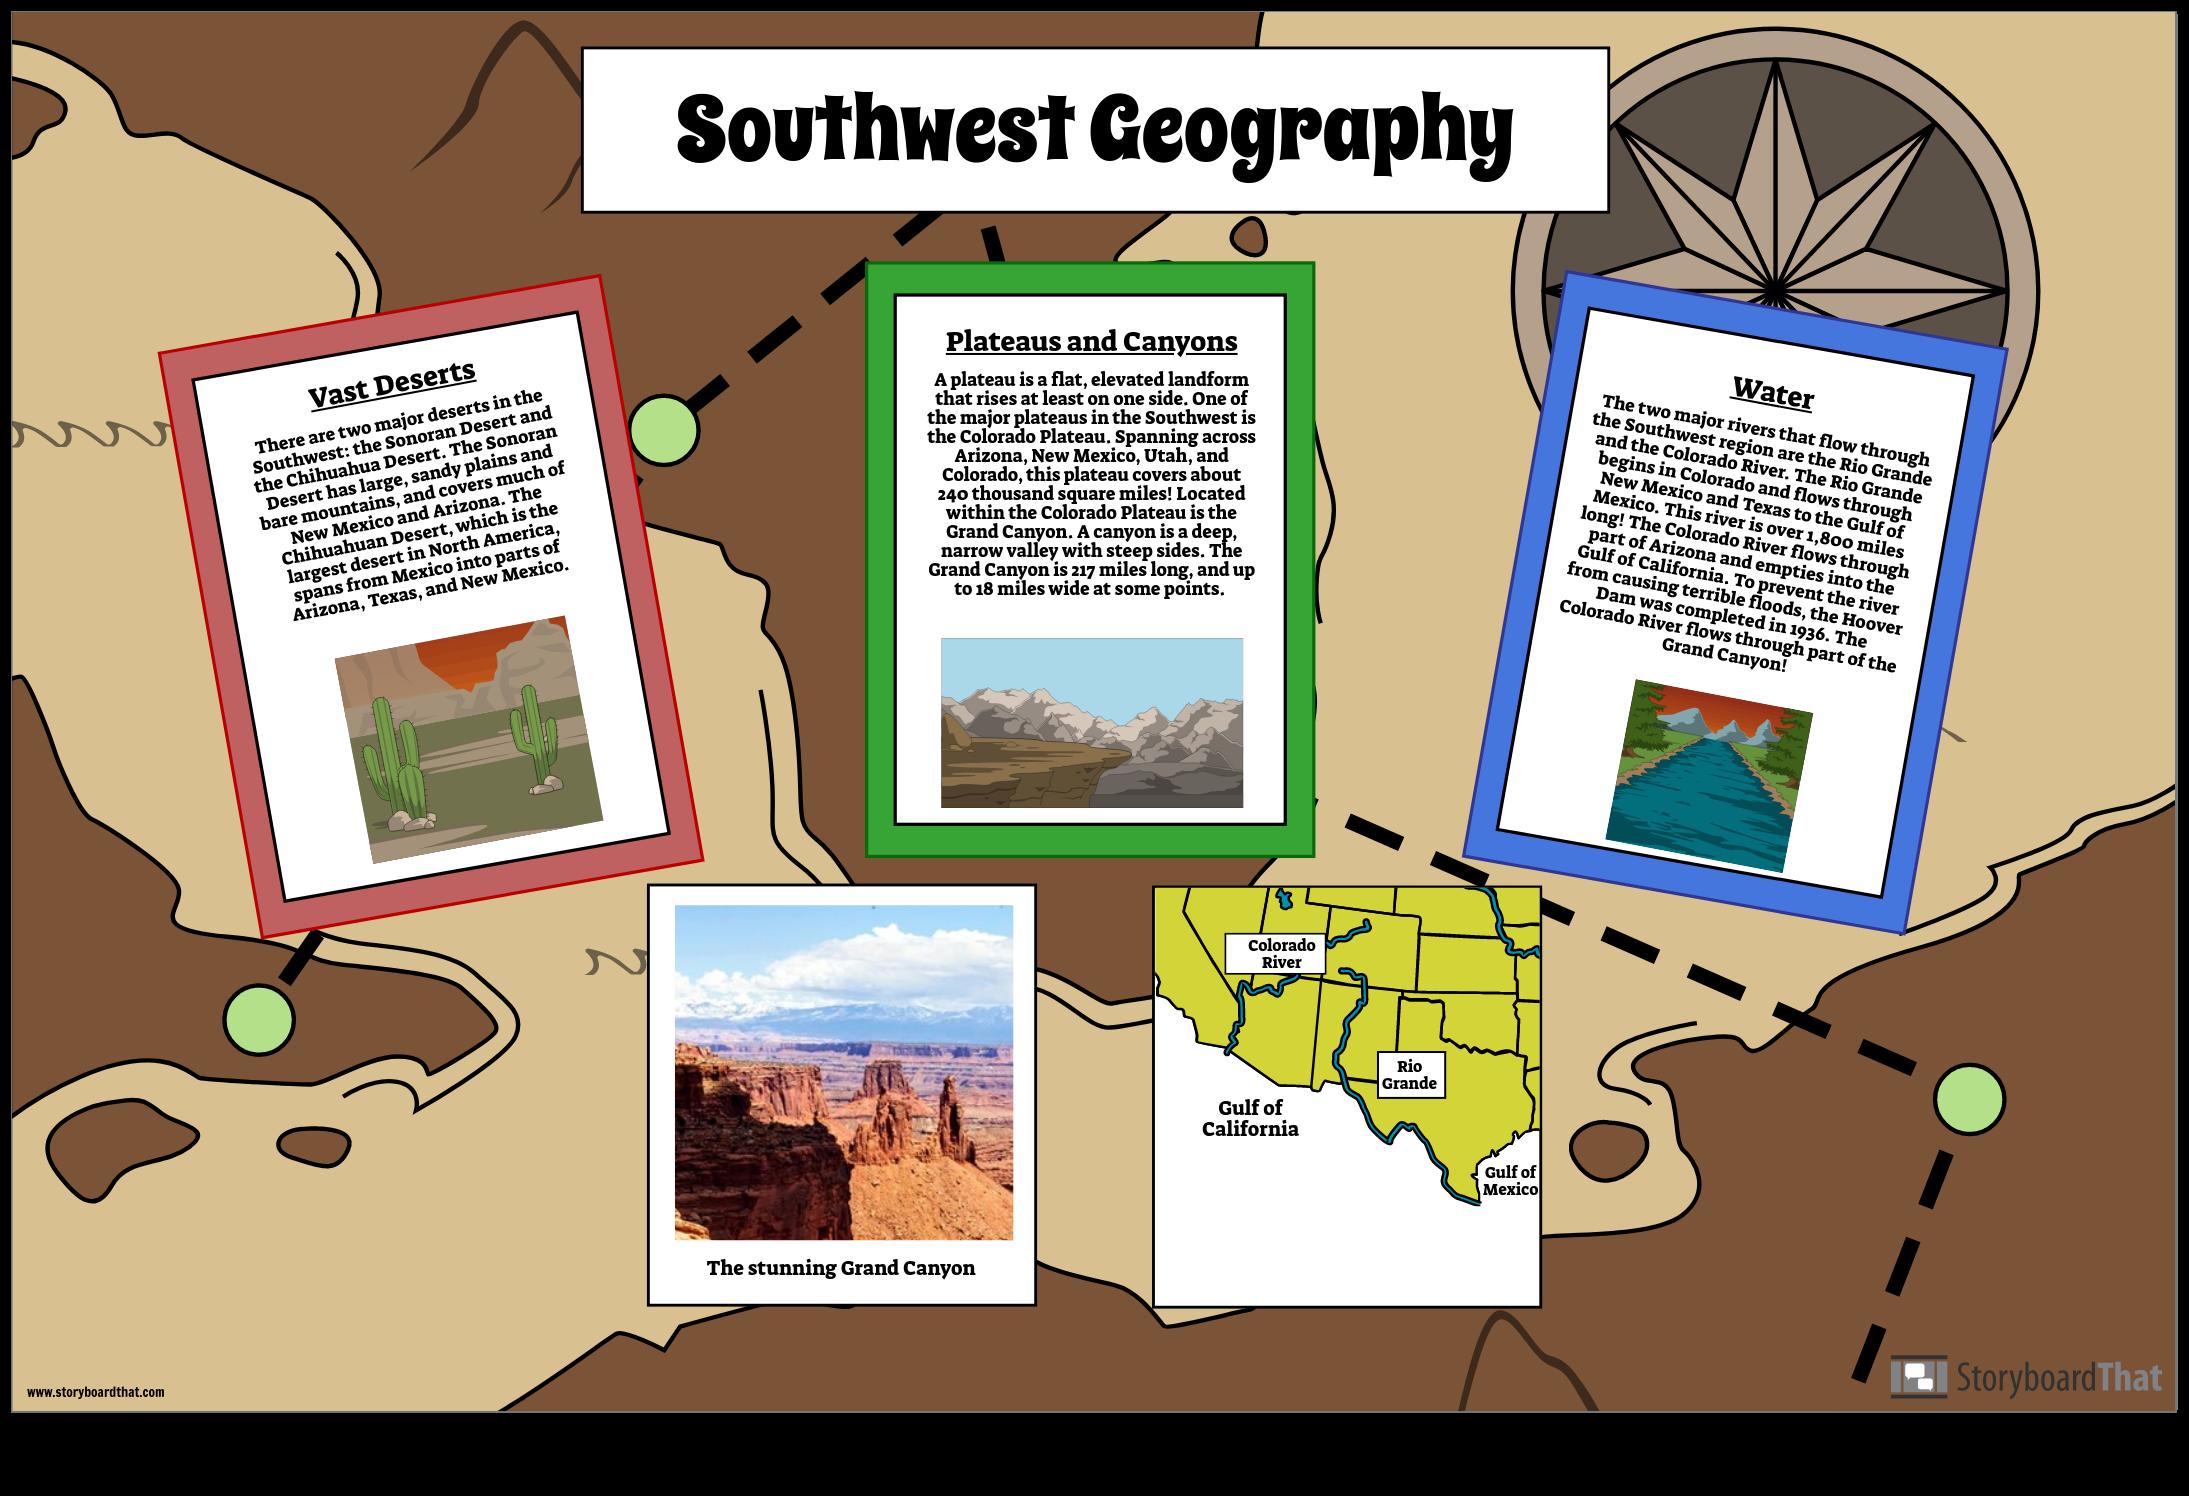 Southwest Geography